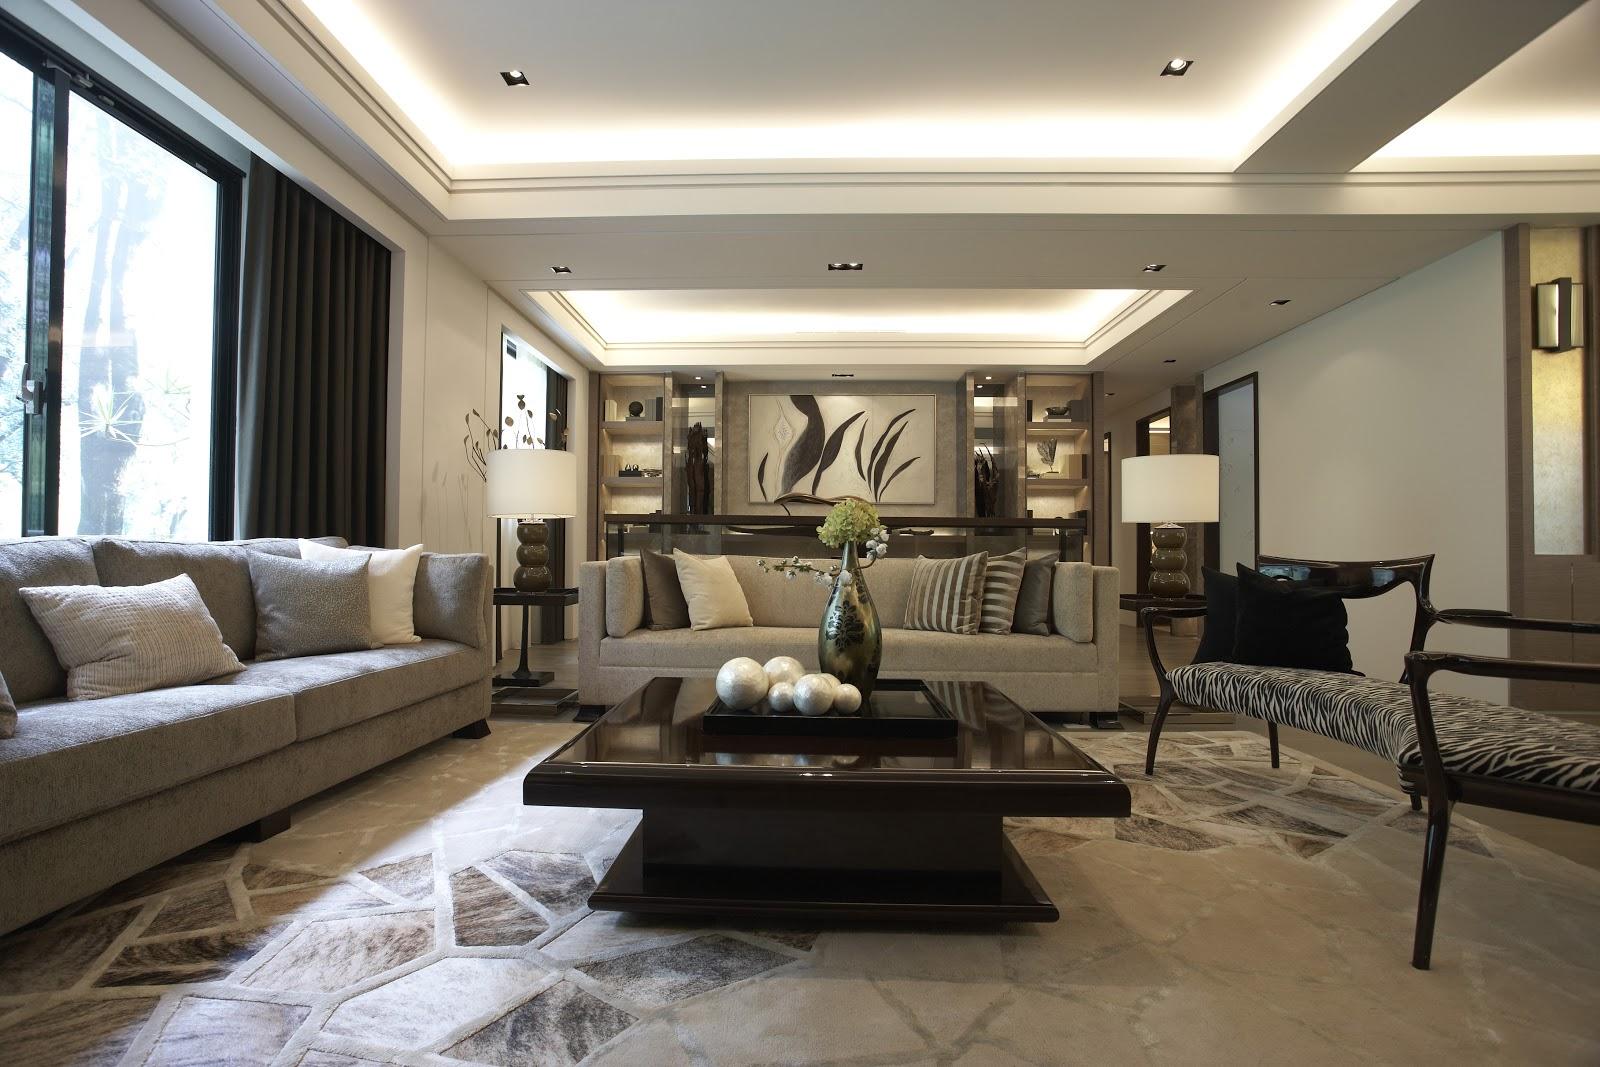 Hoonto interior design for Best interior design blogs 2012